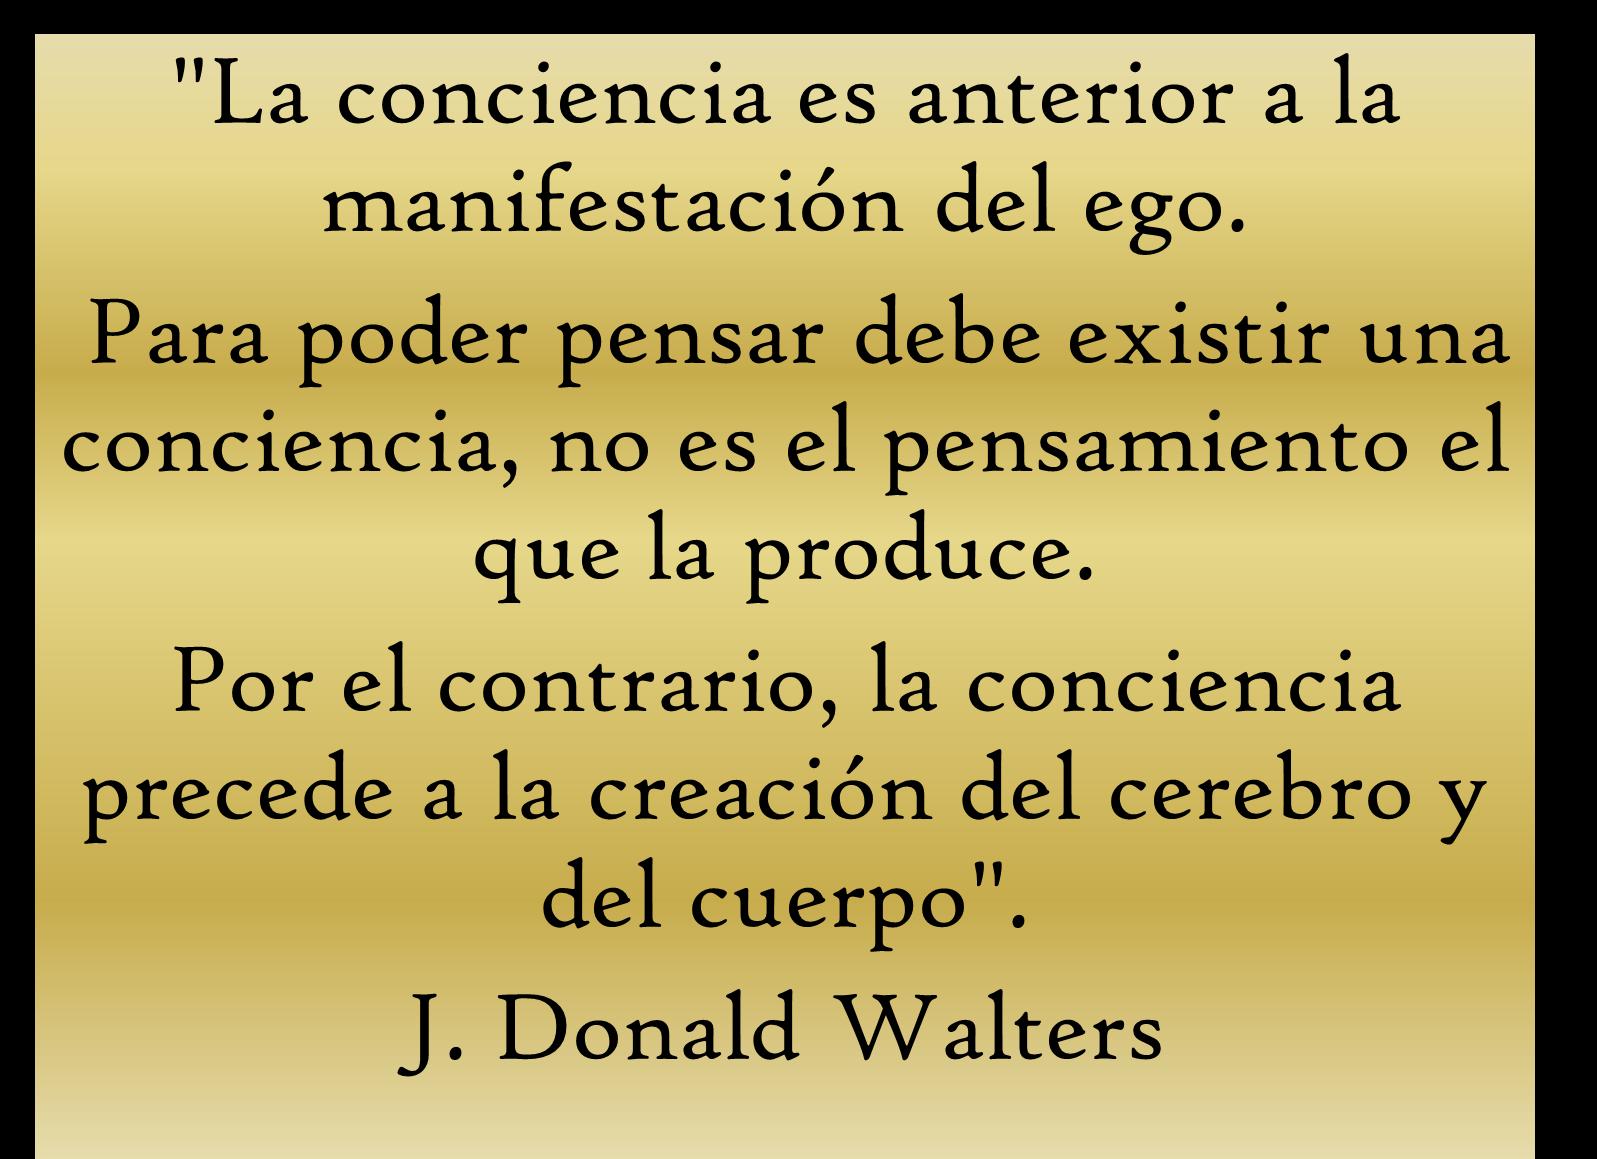 J.Donald Walters